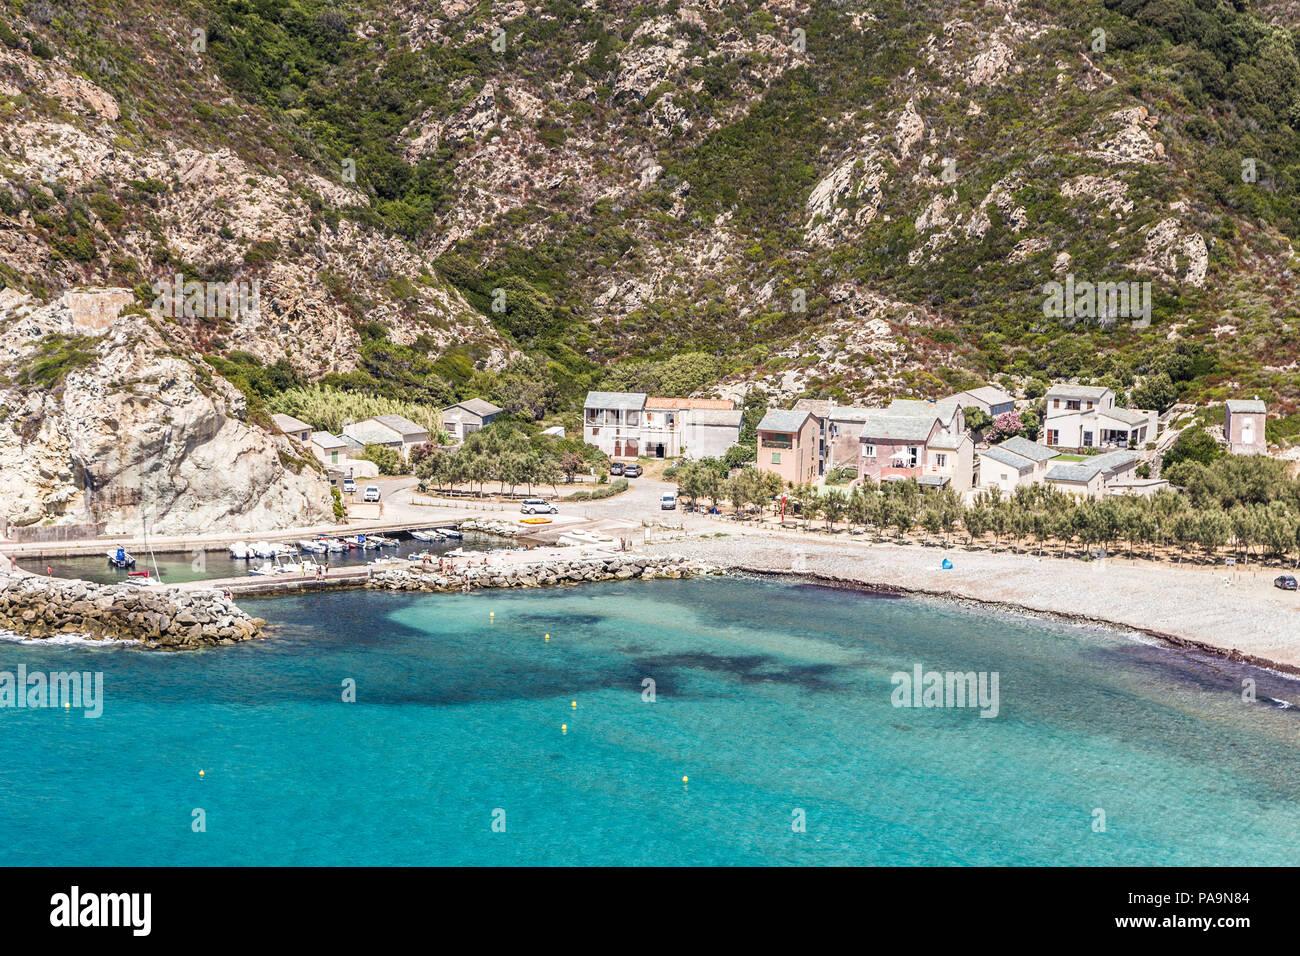 Idyllic bay along the coast  of Corsica in France near the Ile Rousse village. - Stock Image